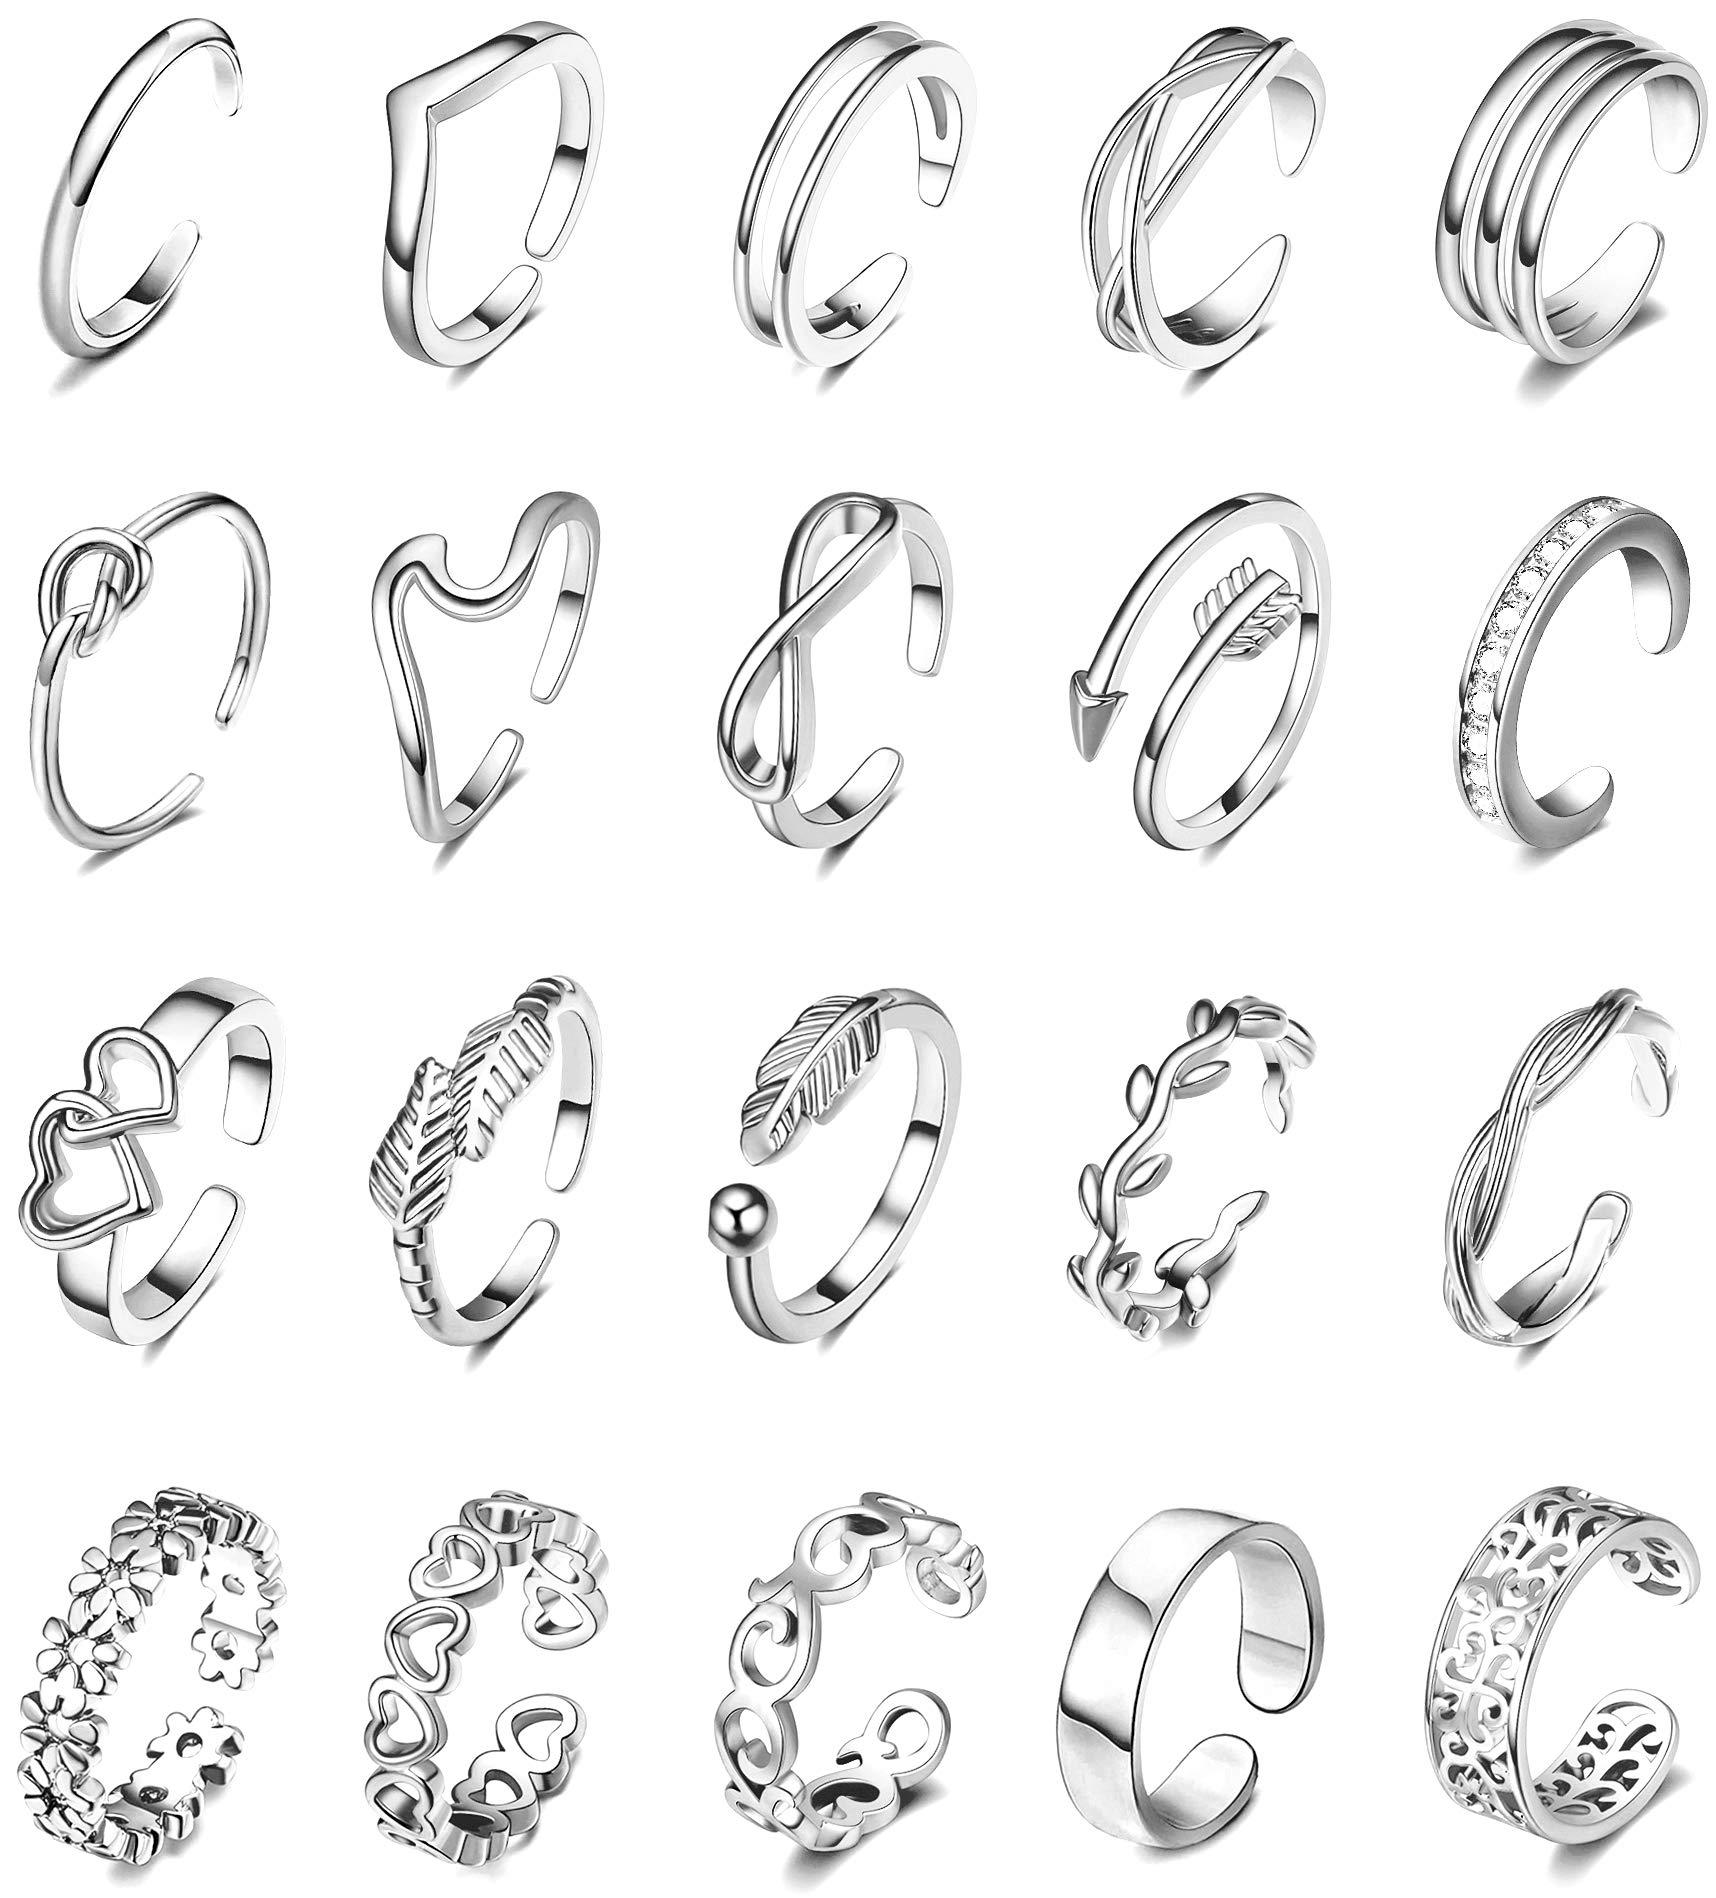 SHIWE 20PCS Adjustable Toe Rings for Women Rose Gold Silver Hypoallergenic Open Toe Ring Set Women Beach Foot Jewelry